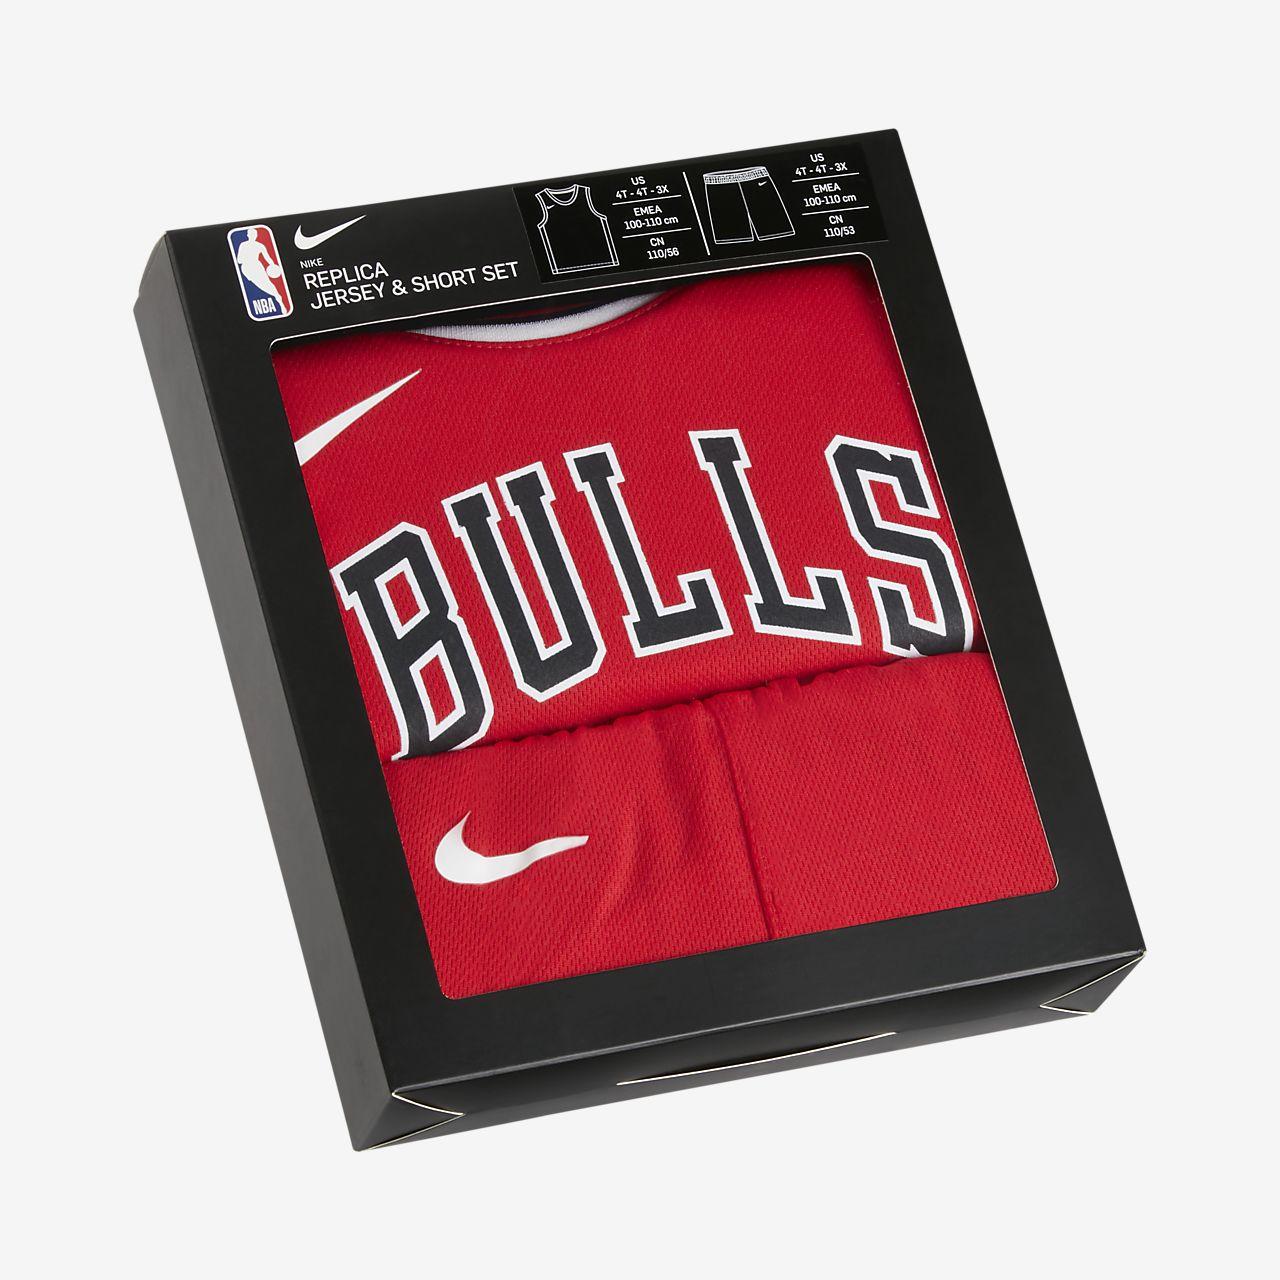 Bulls Replica Conjunto de camiseta y pantalón corto Nike NBA Infantil